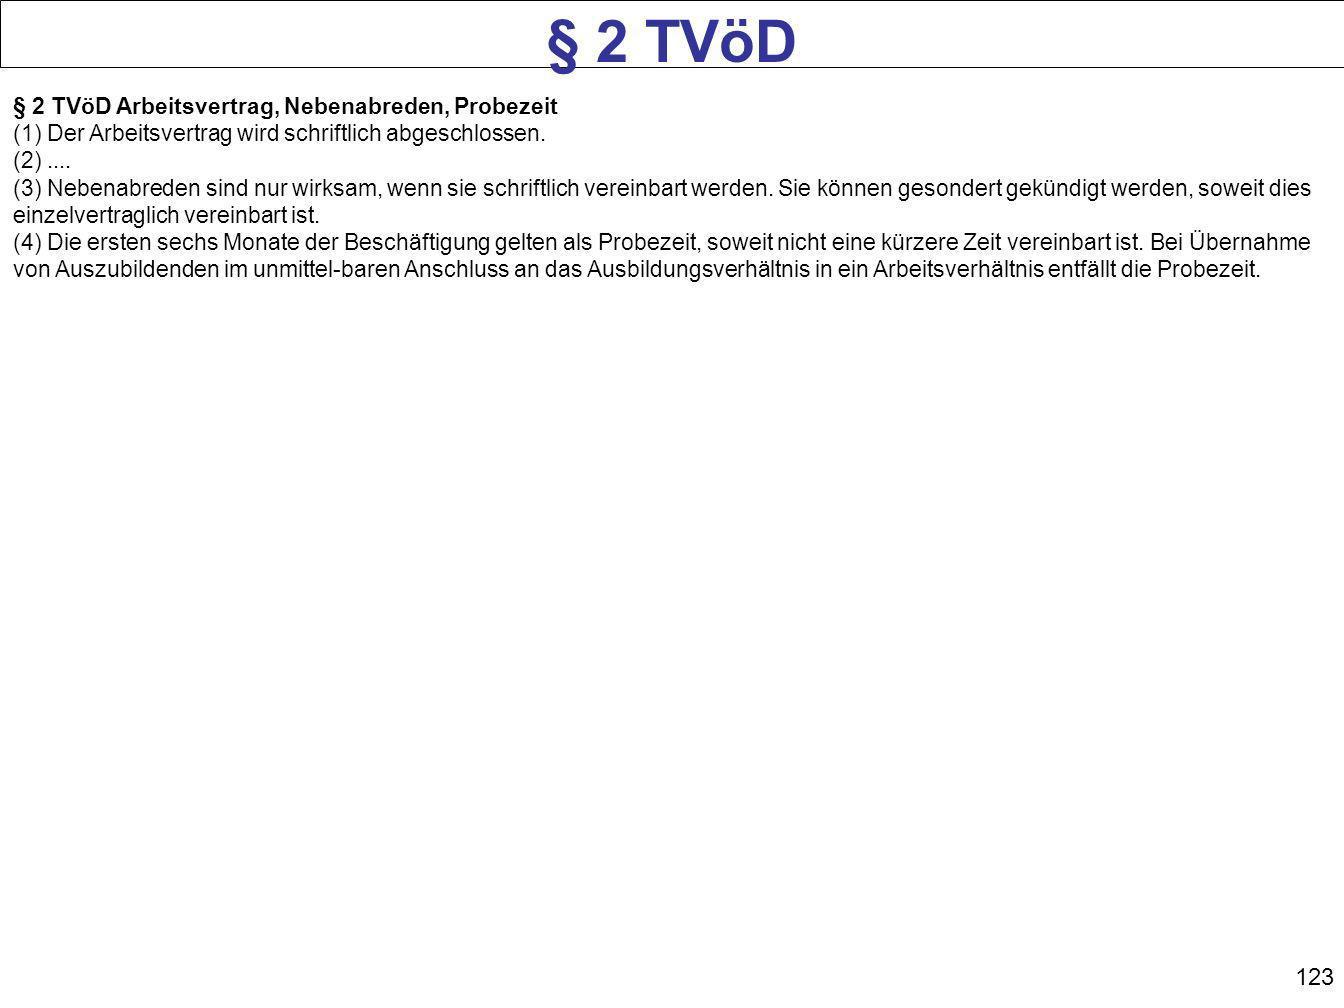 § 2 TVöD § 2 TVöD Arbeitsvertrag, Nebenabreden, Probezeit